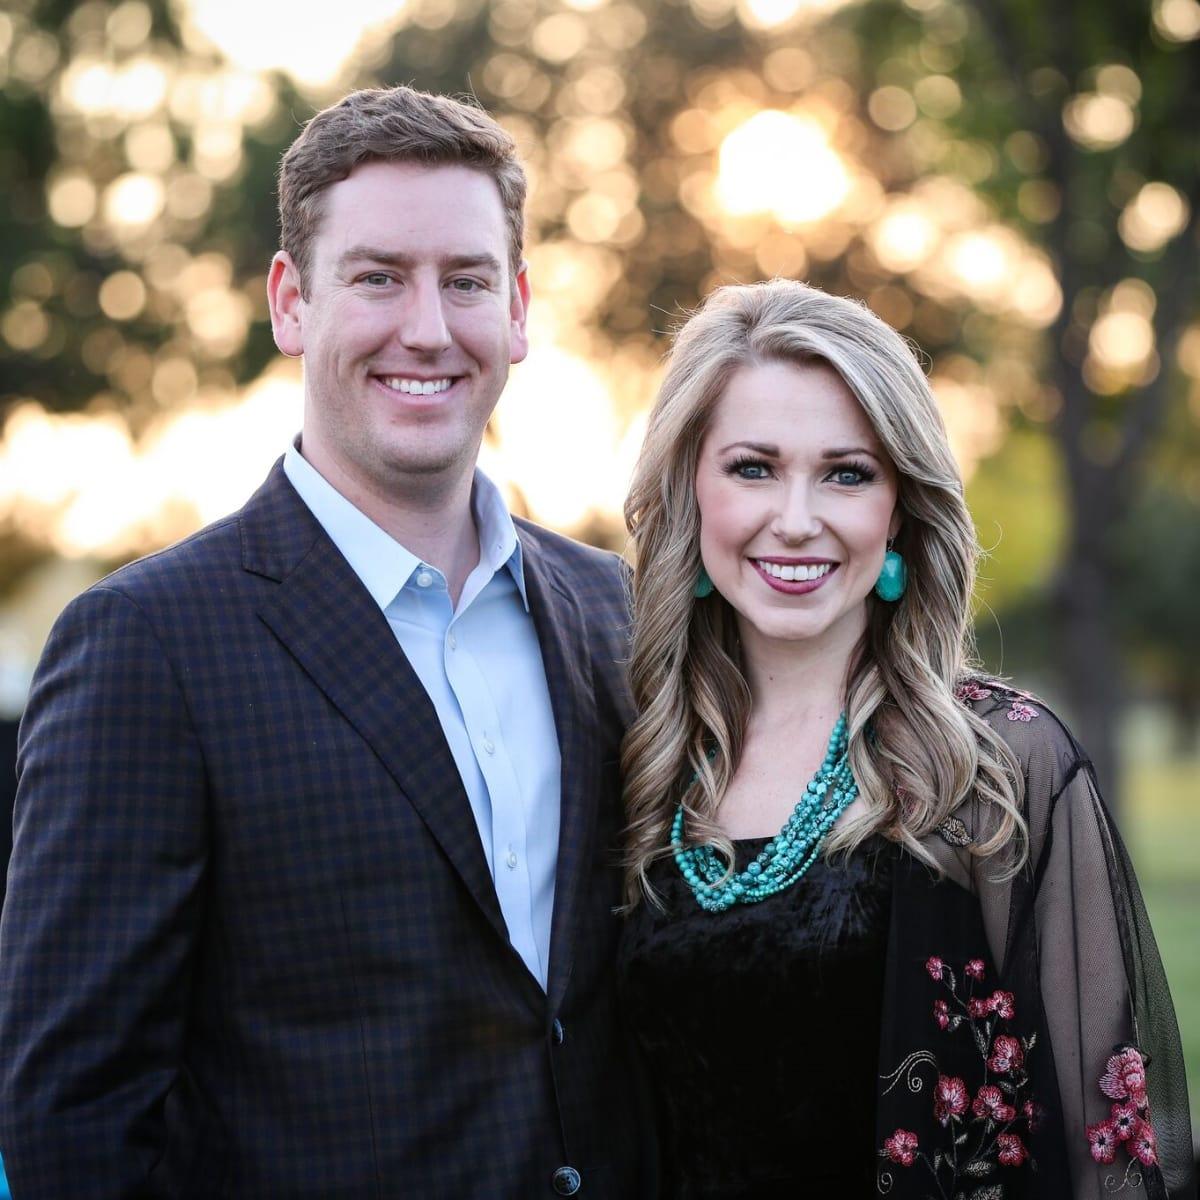 Madison Sawyer, Preston Sawyer, Cowtown Ball